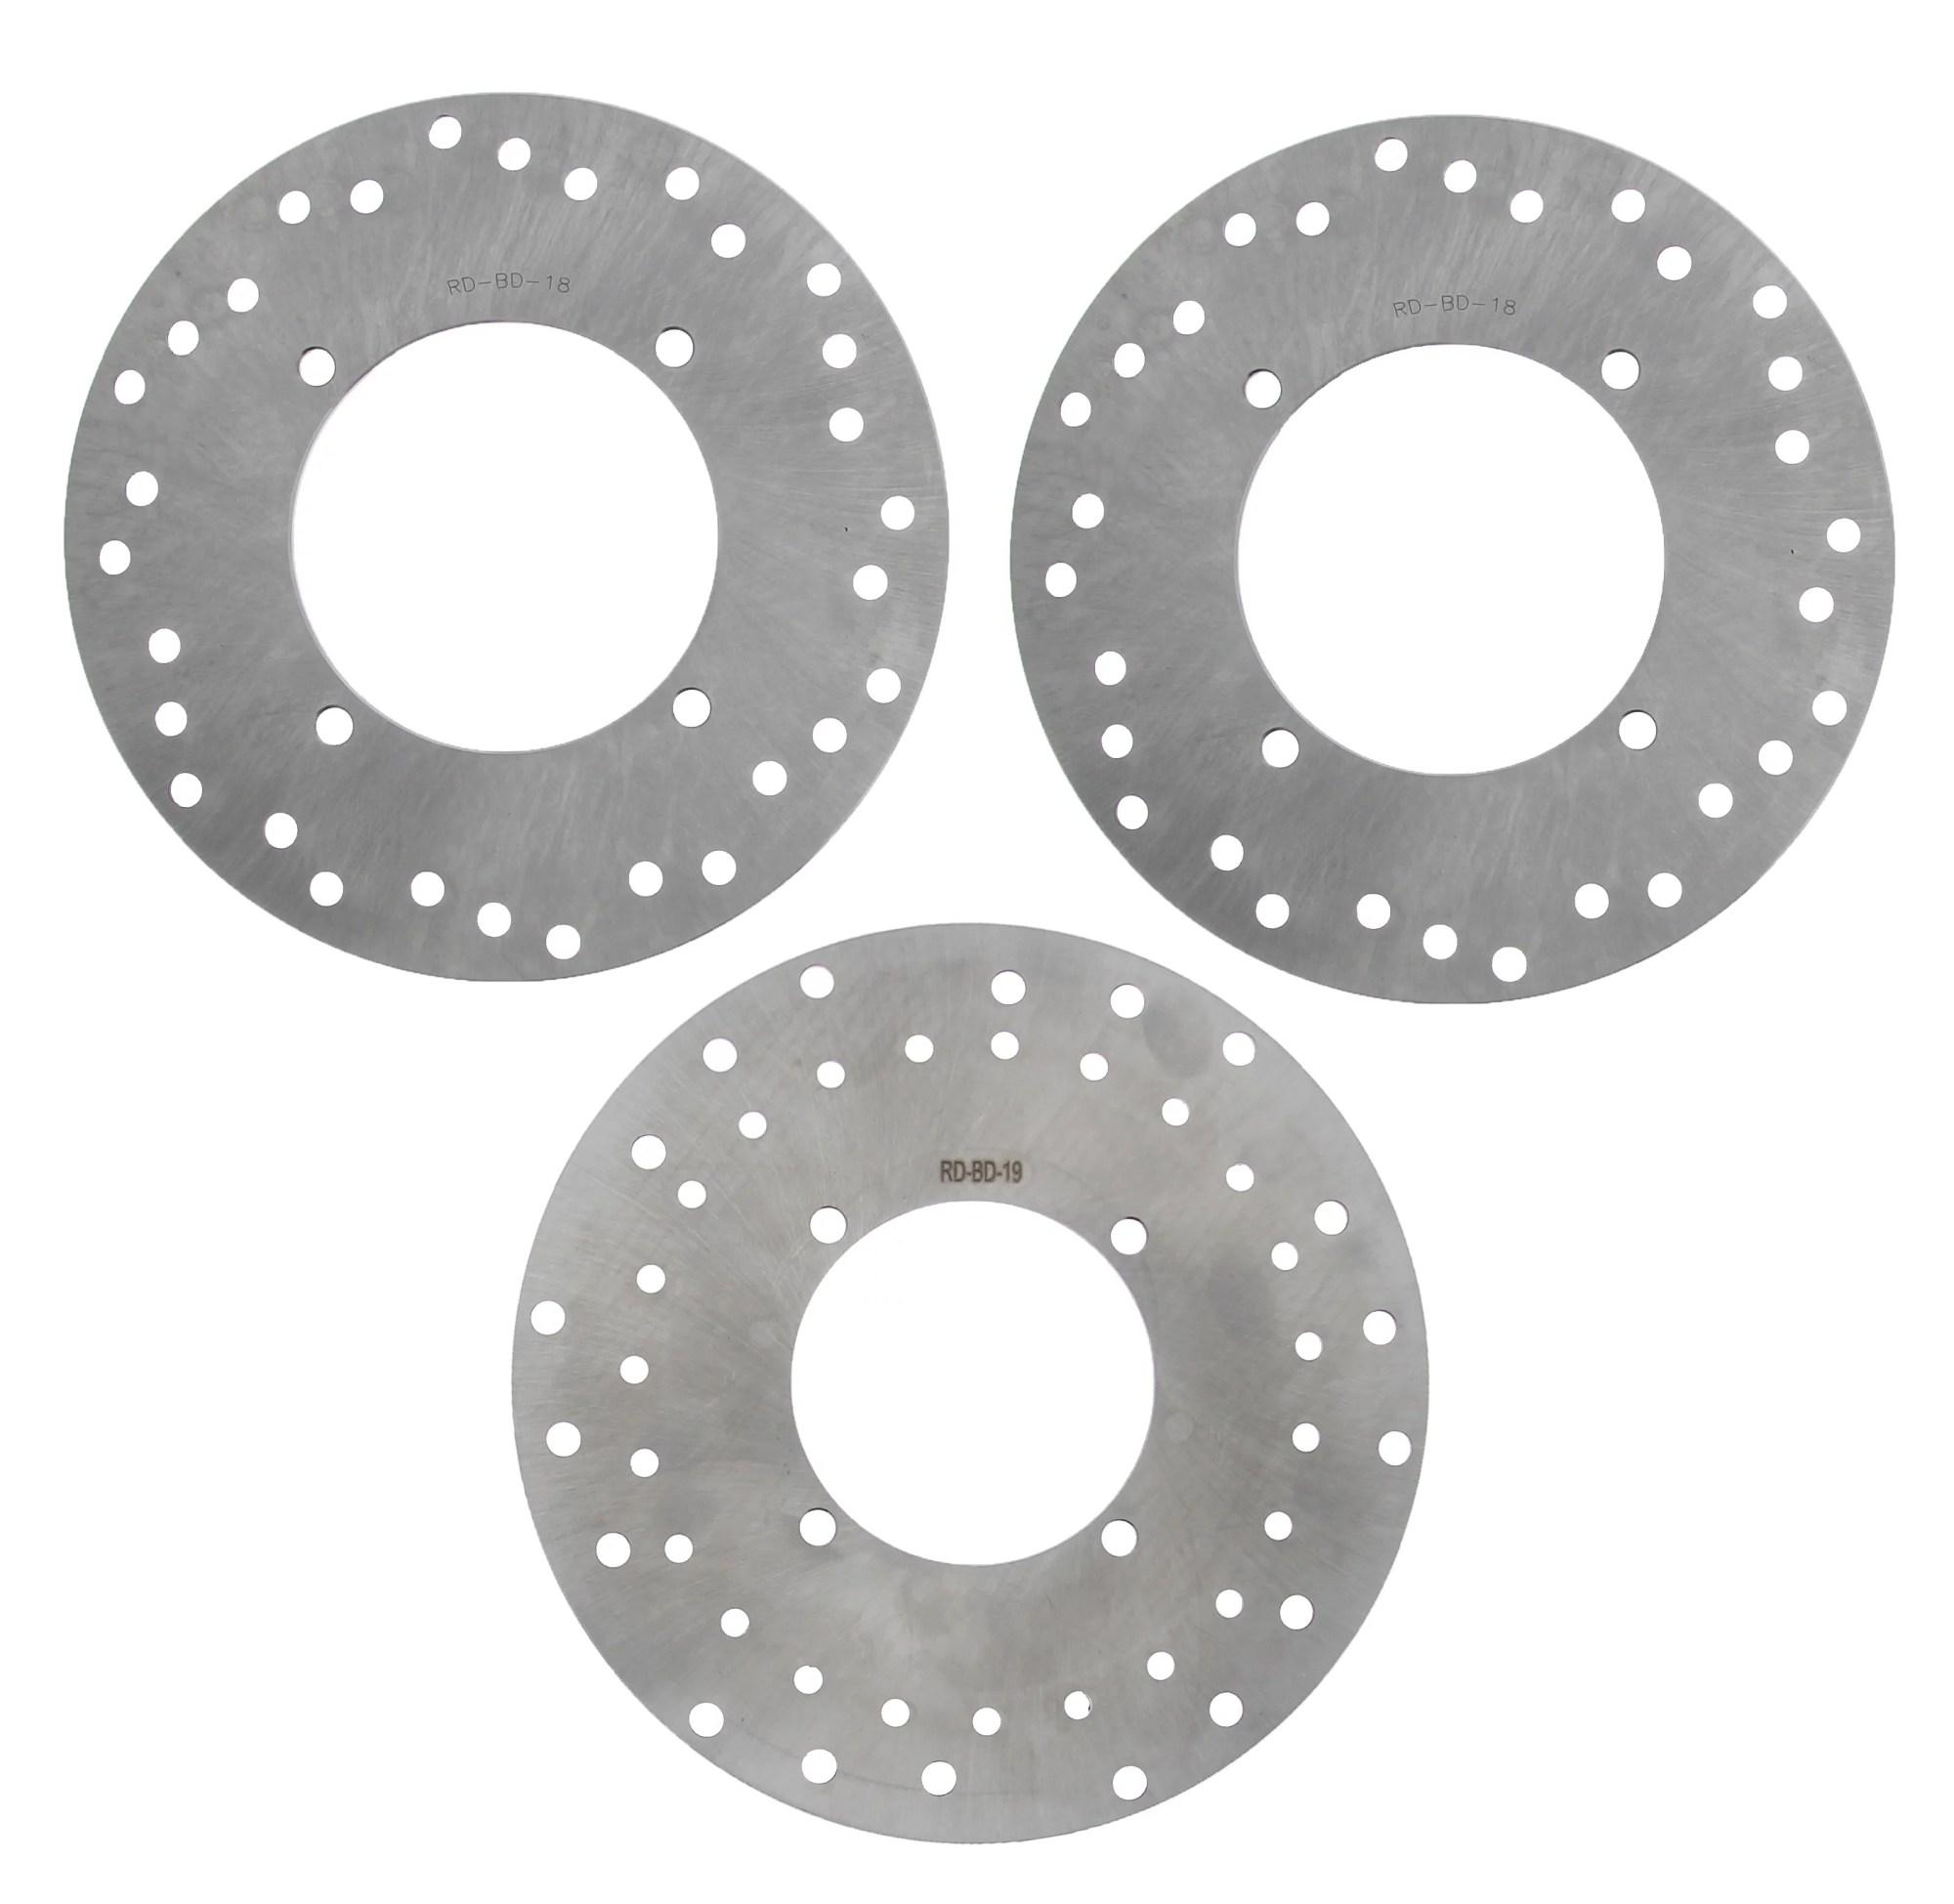 hight resolution of 2005 2006 polaris sportsman 500 4x4 ho front rear brake rotors discs walmart com